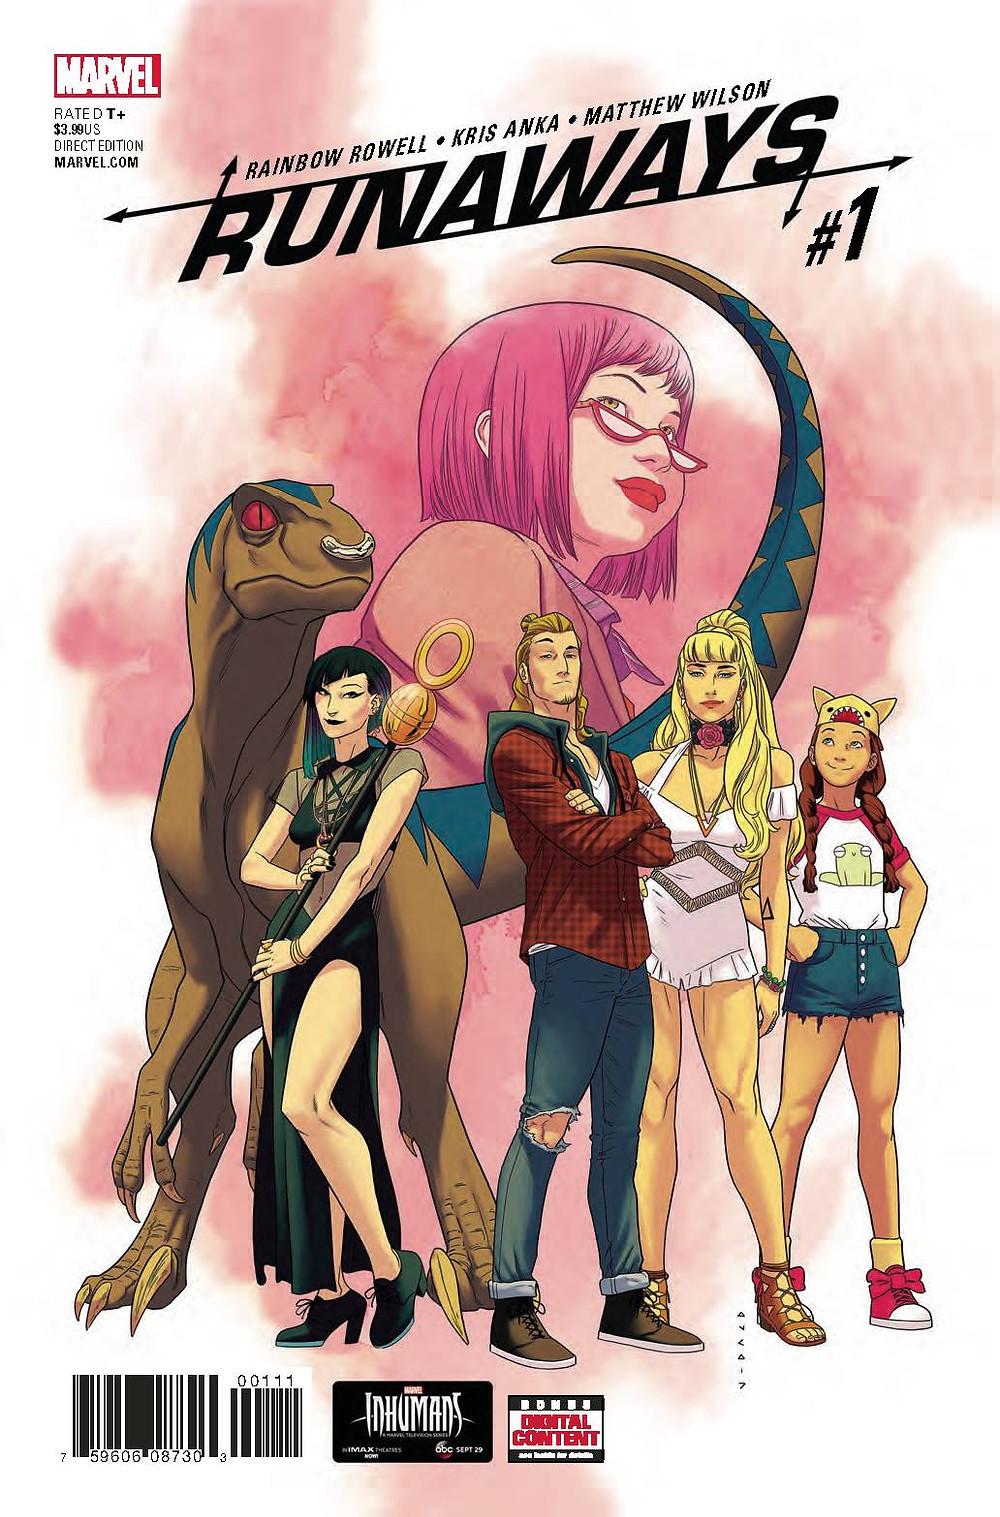 Ms Marvel #15